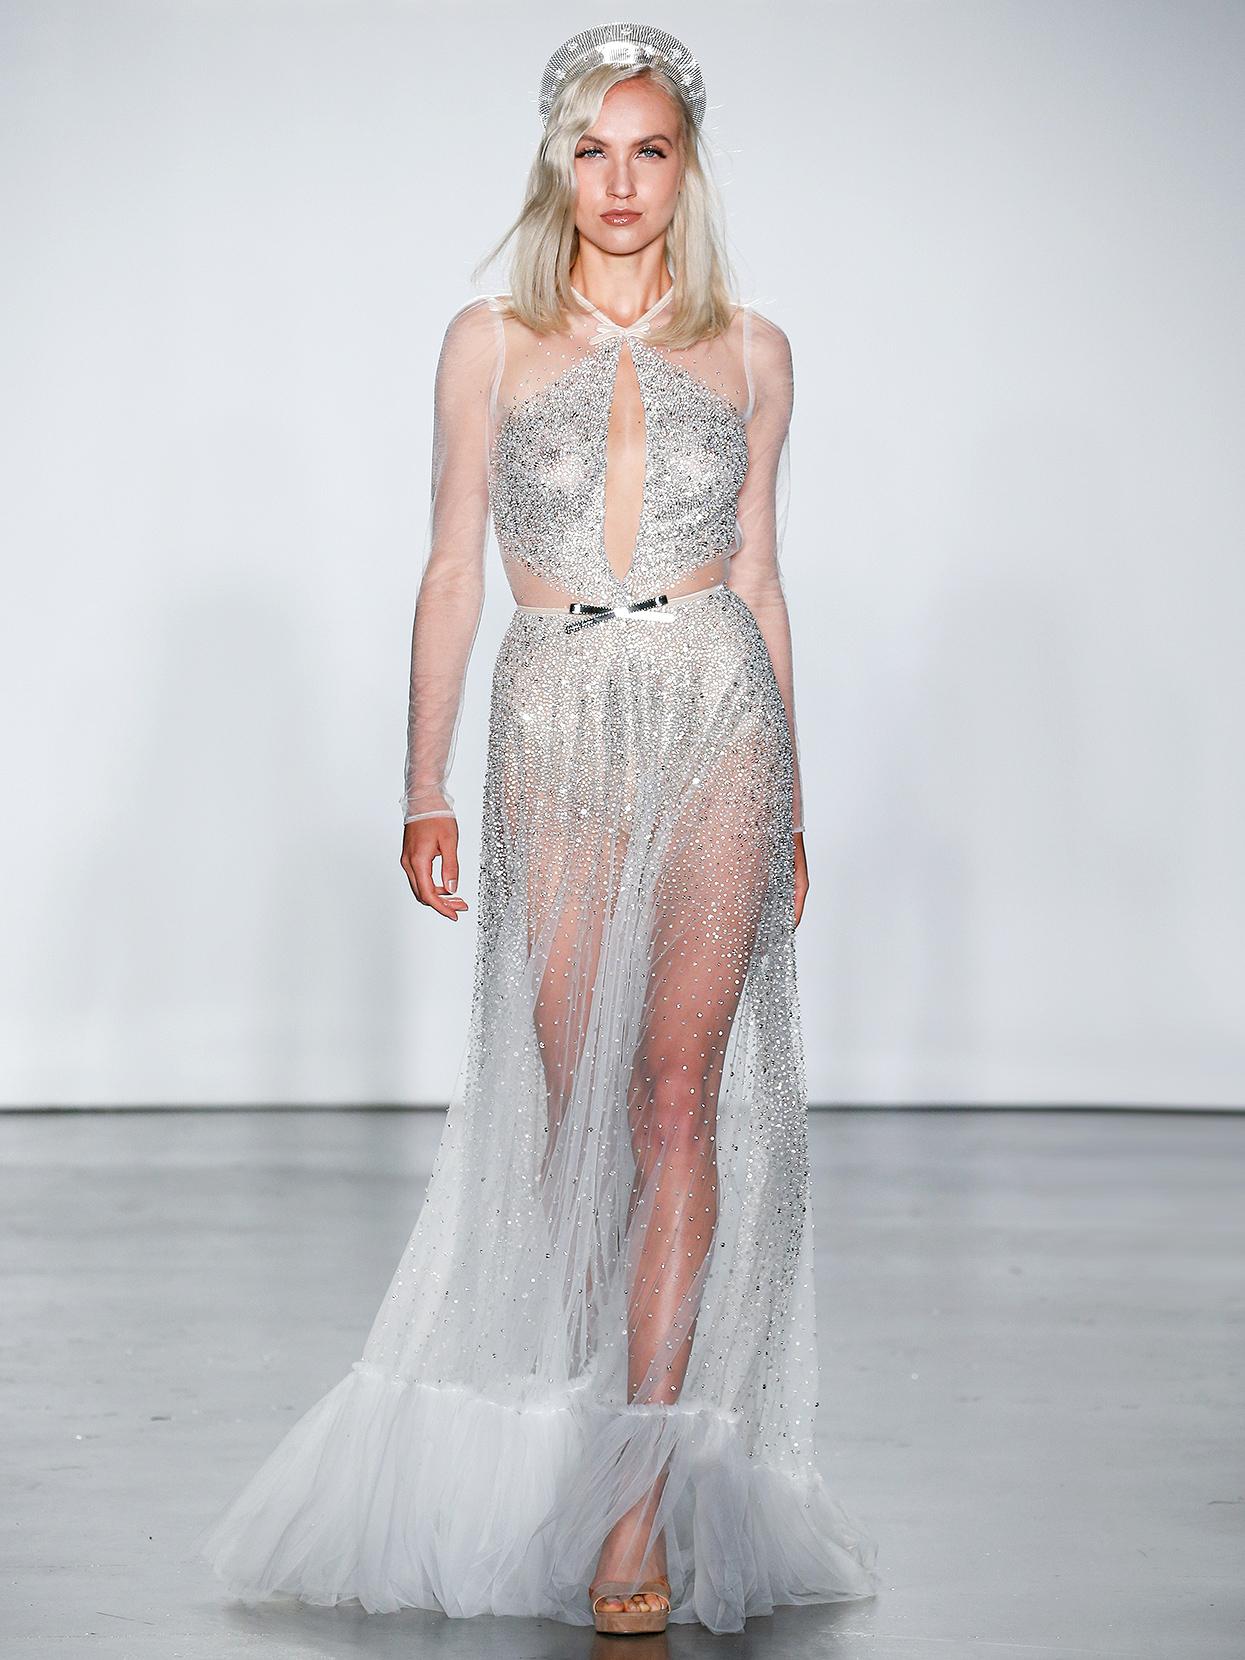 Inbal Dror illusion neck sheer with cutouts wedding dress fall 2020